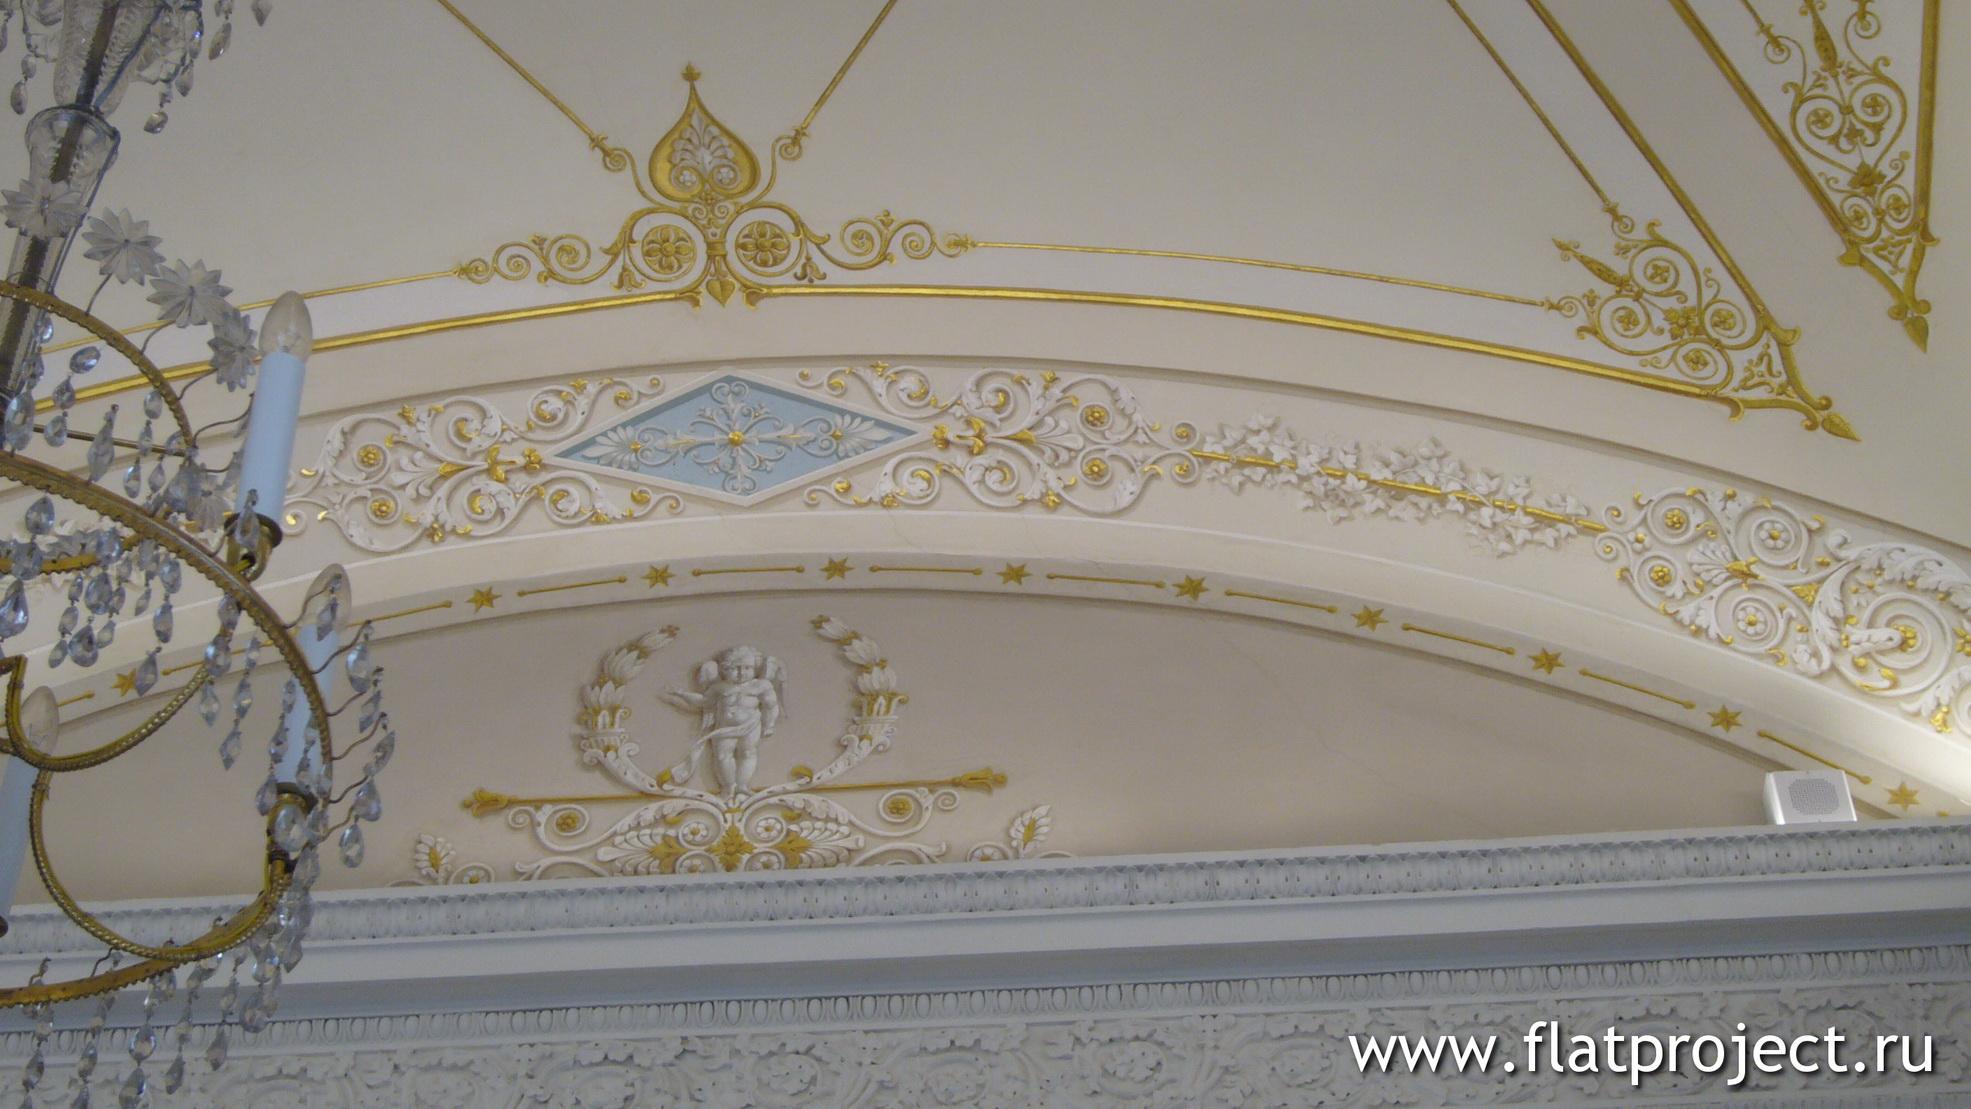 The State Hermitage museum interiors – photo 288